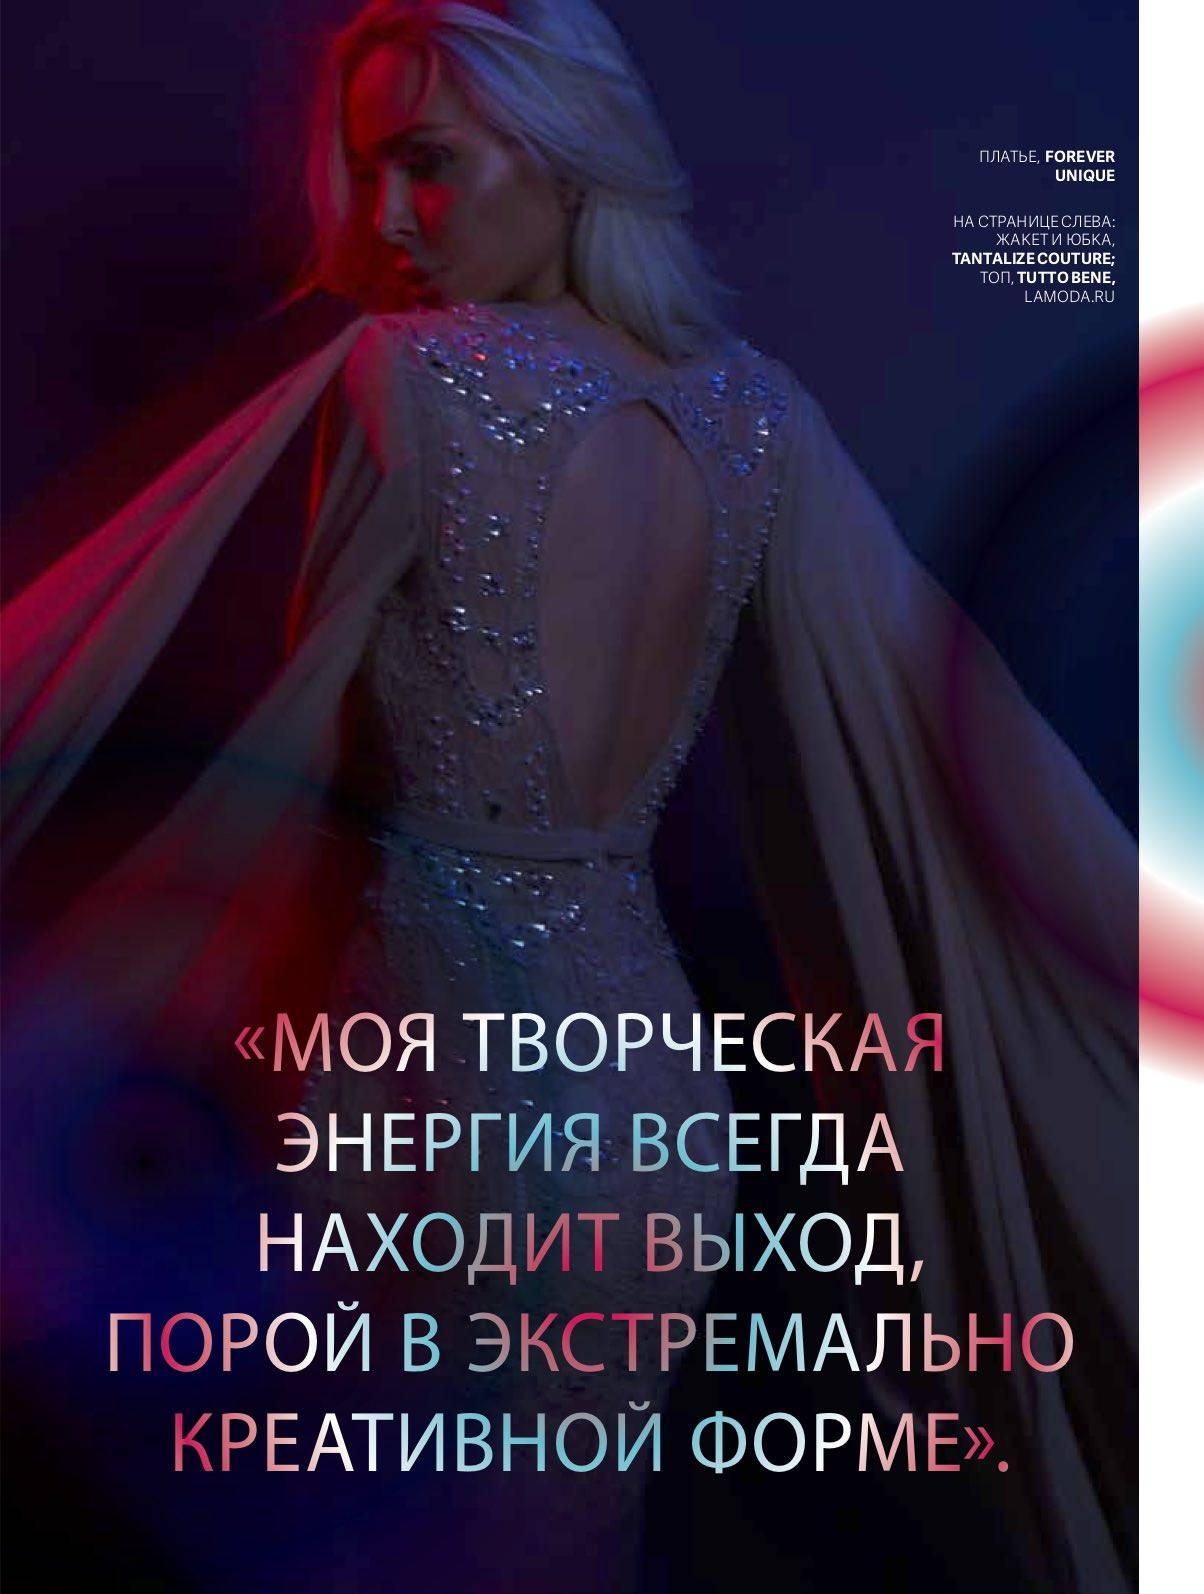 Новогодняя фея Алиса Лобанова: «Я знаю, чего хотят дети!»